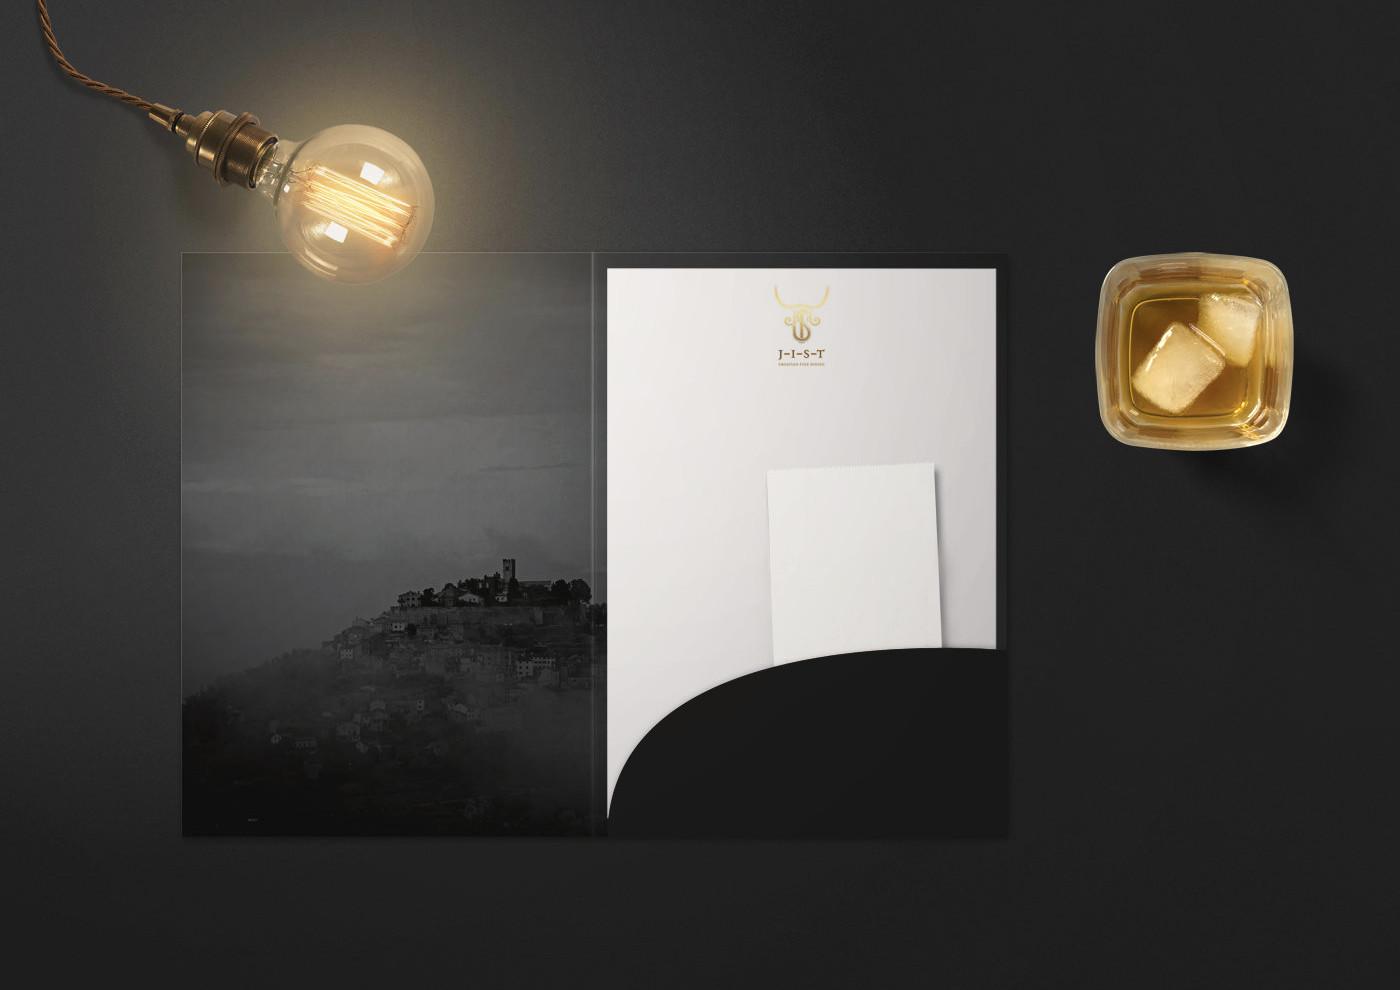 zambelli_brand_design-jist